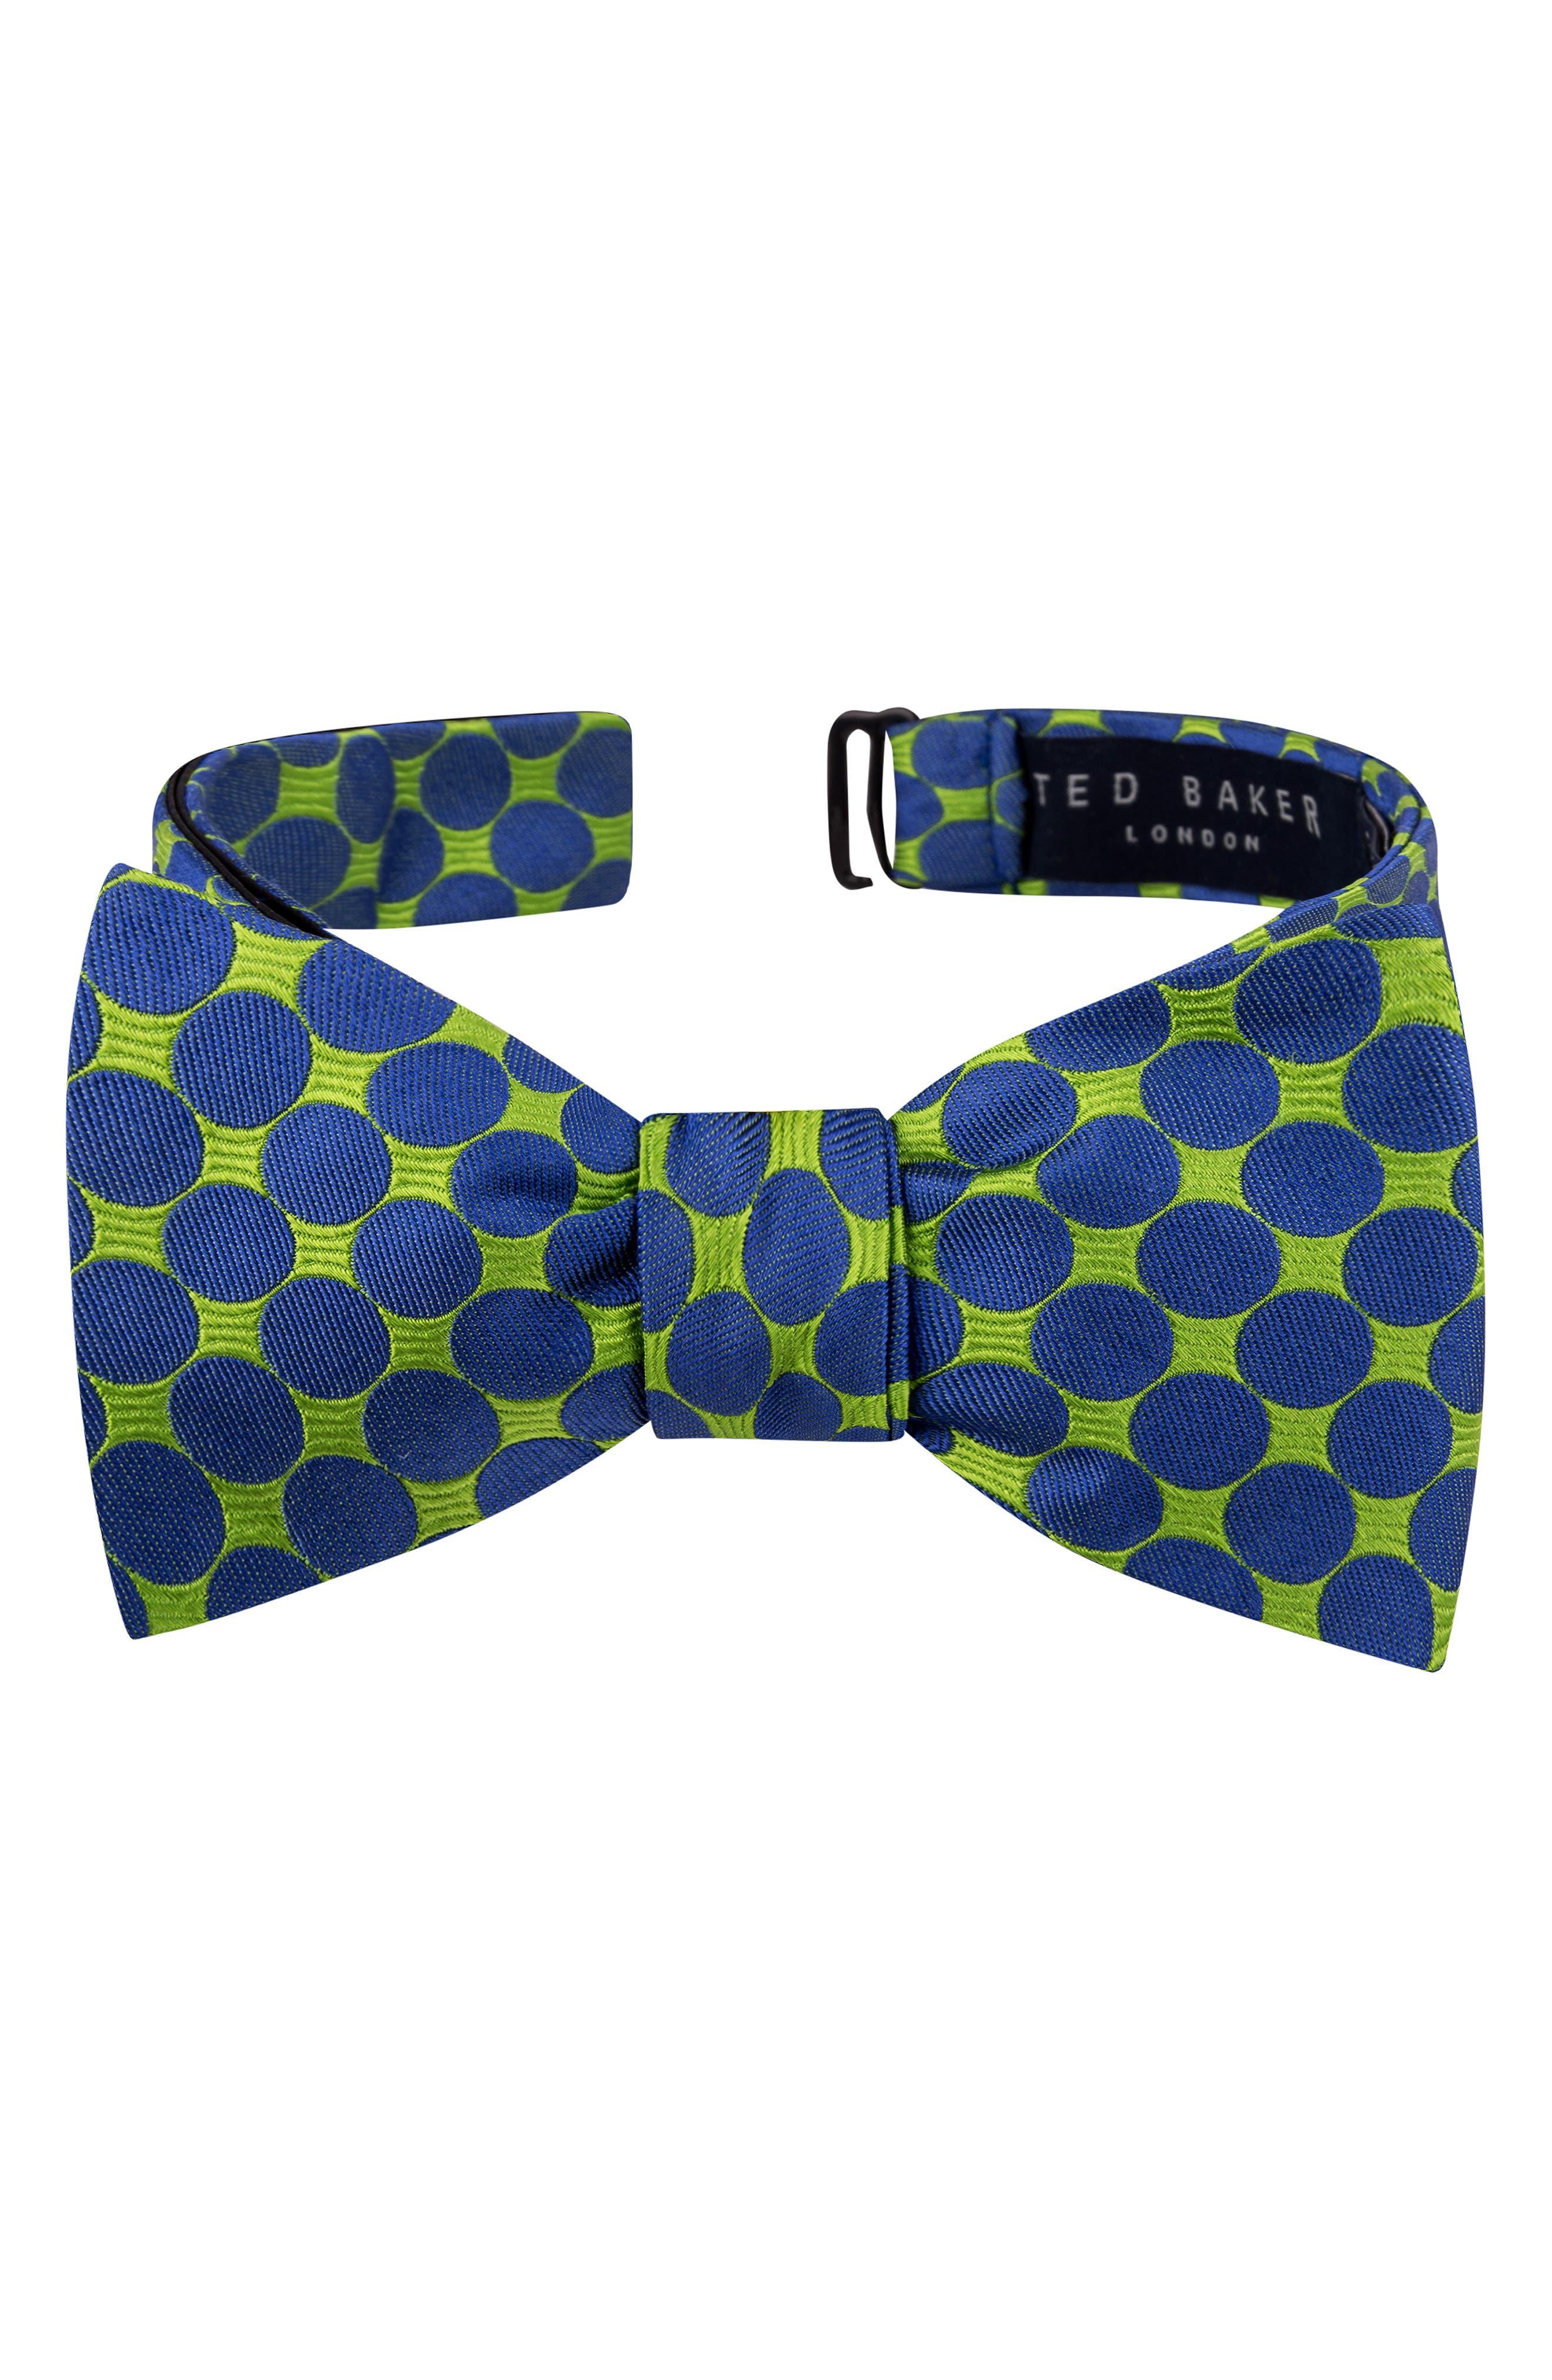 1950s Men's Clothing Mens Ted Baker London Circles Silk Bow Tie Size Regular - Green $59.50 AT vintagedancer.com